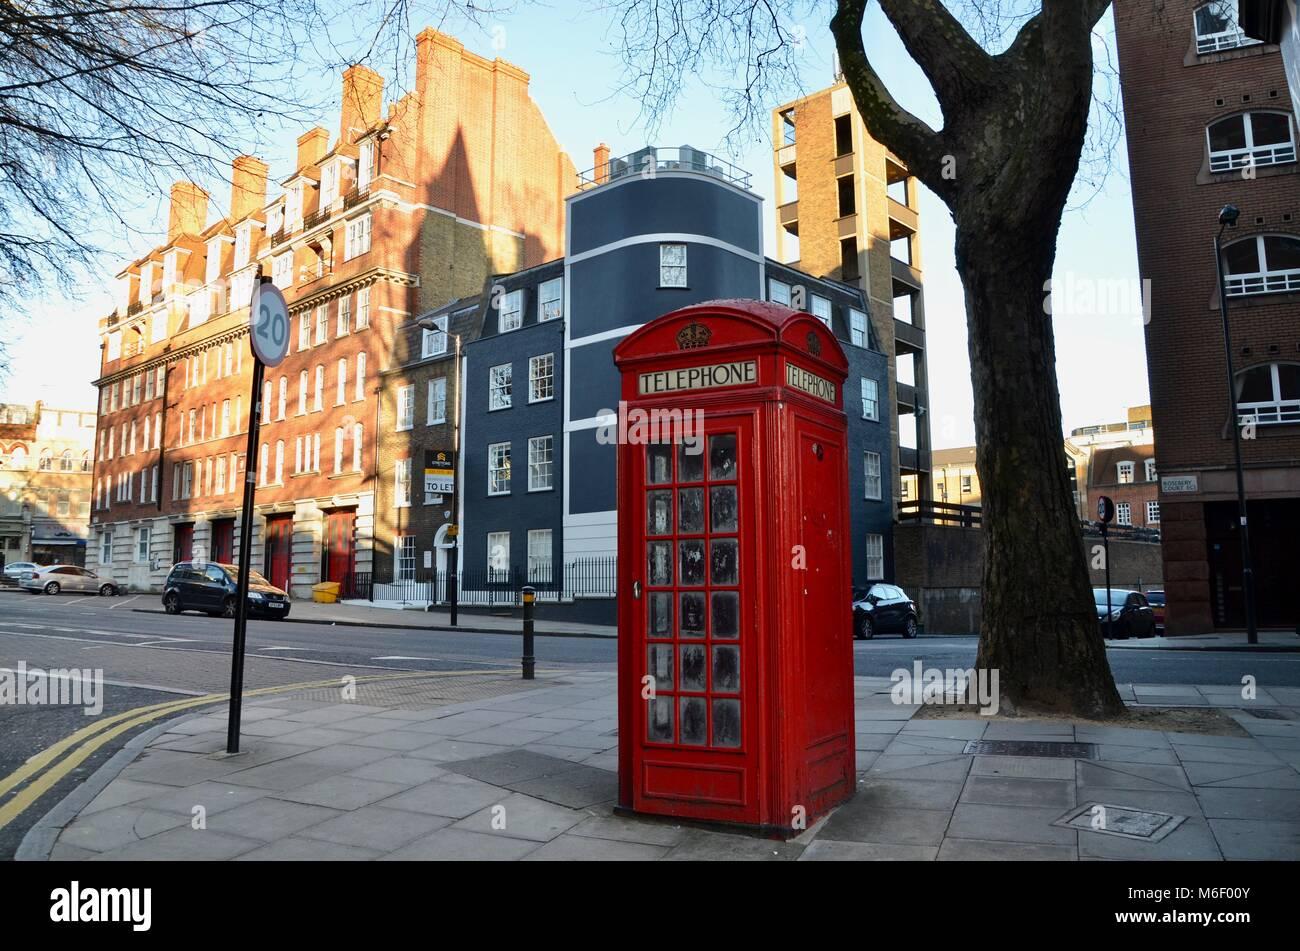 the iconic k2 telephone kiosk design seen here in clerkenwell london great britain - Stock Image